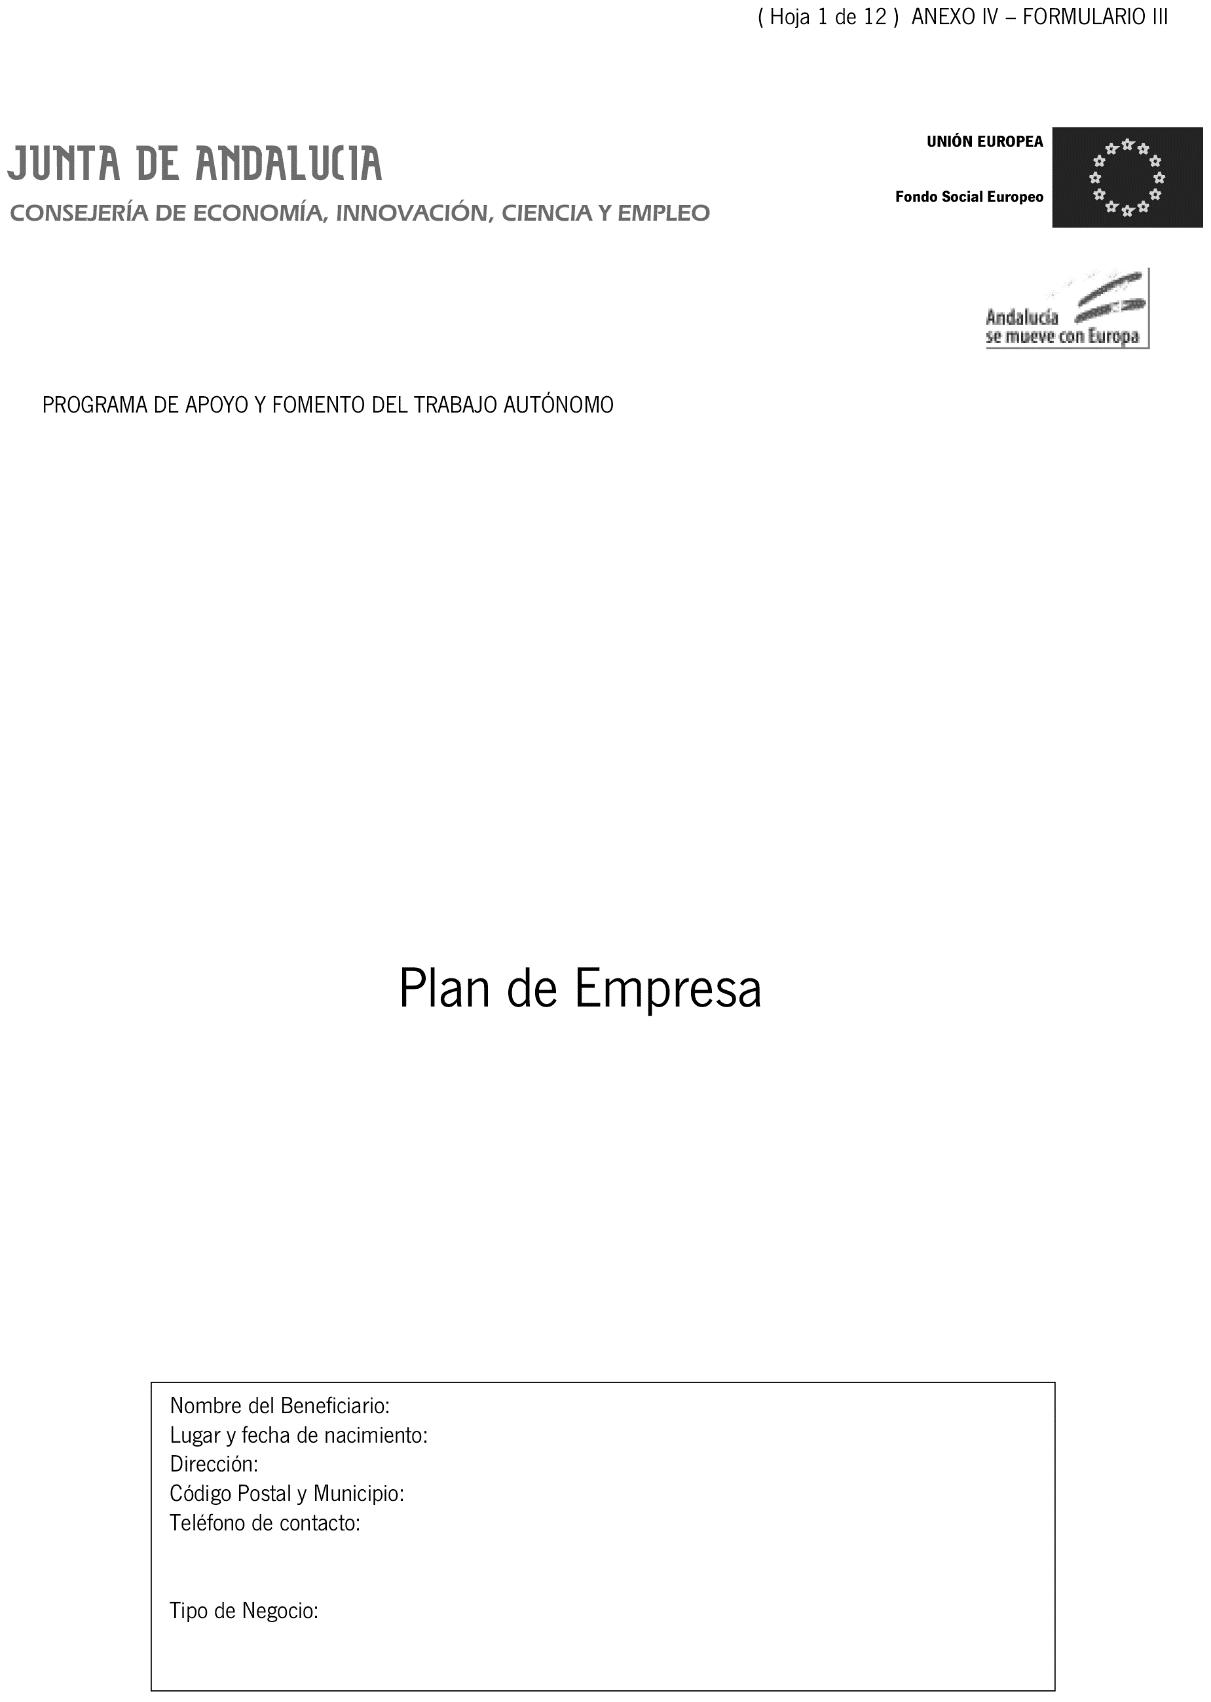 BOE.es - Documento BOJA-b-2013-90009